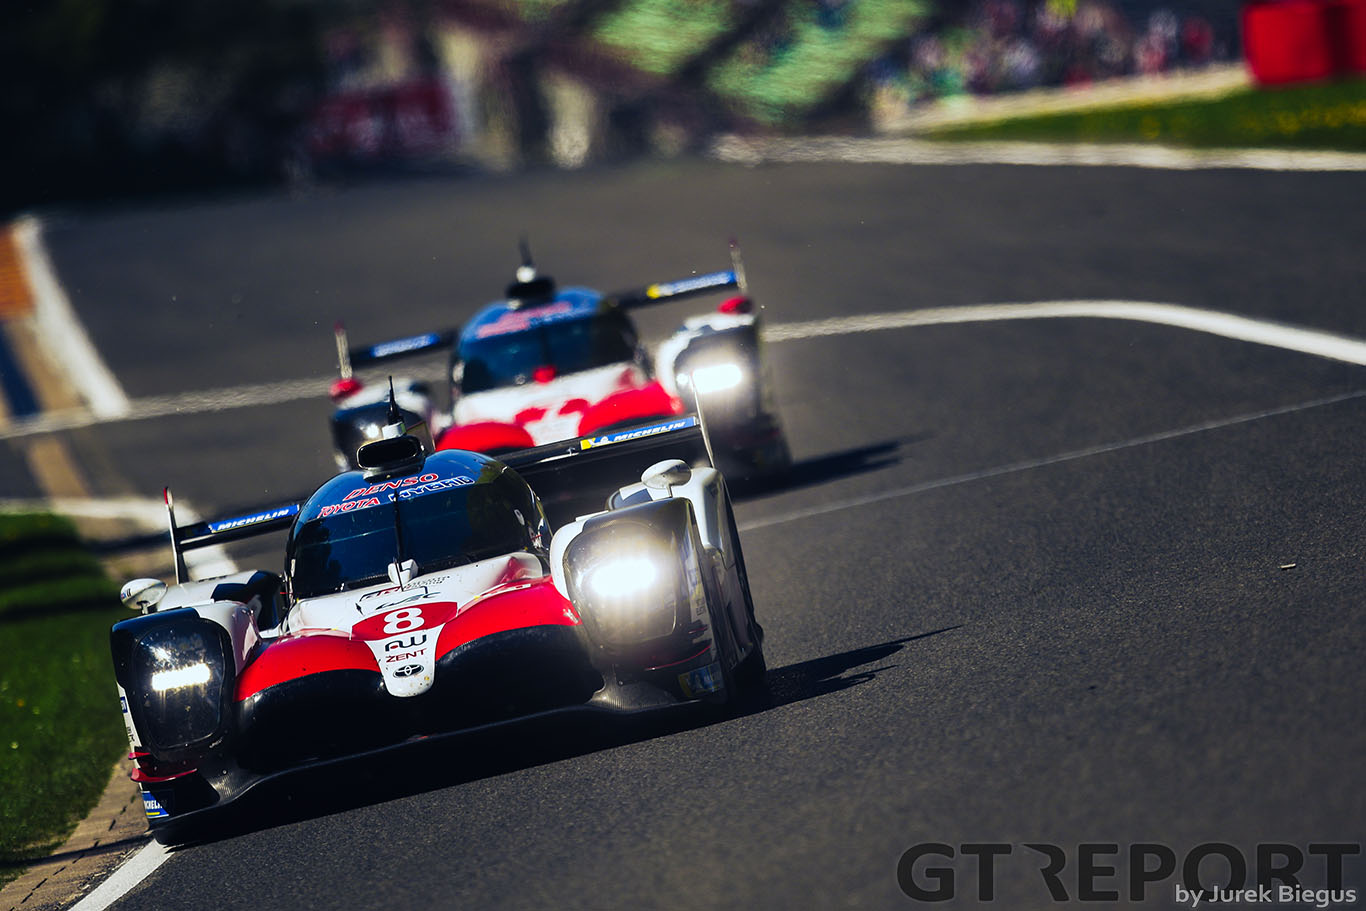 FIA WEC Spa race report: Alone in a crowd